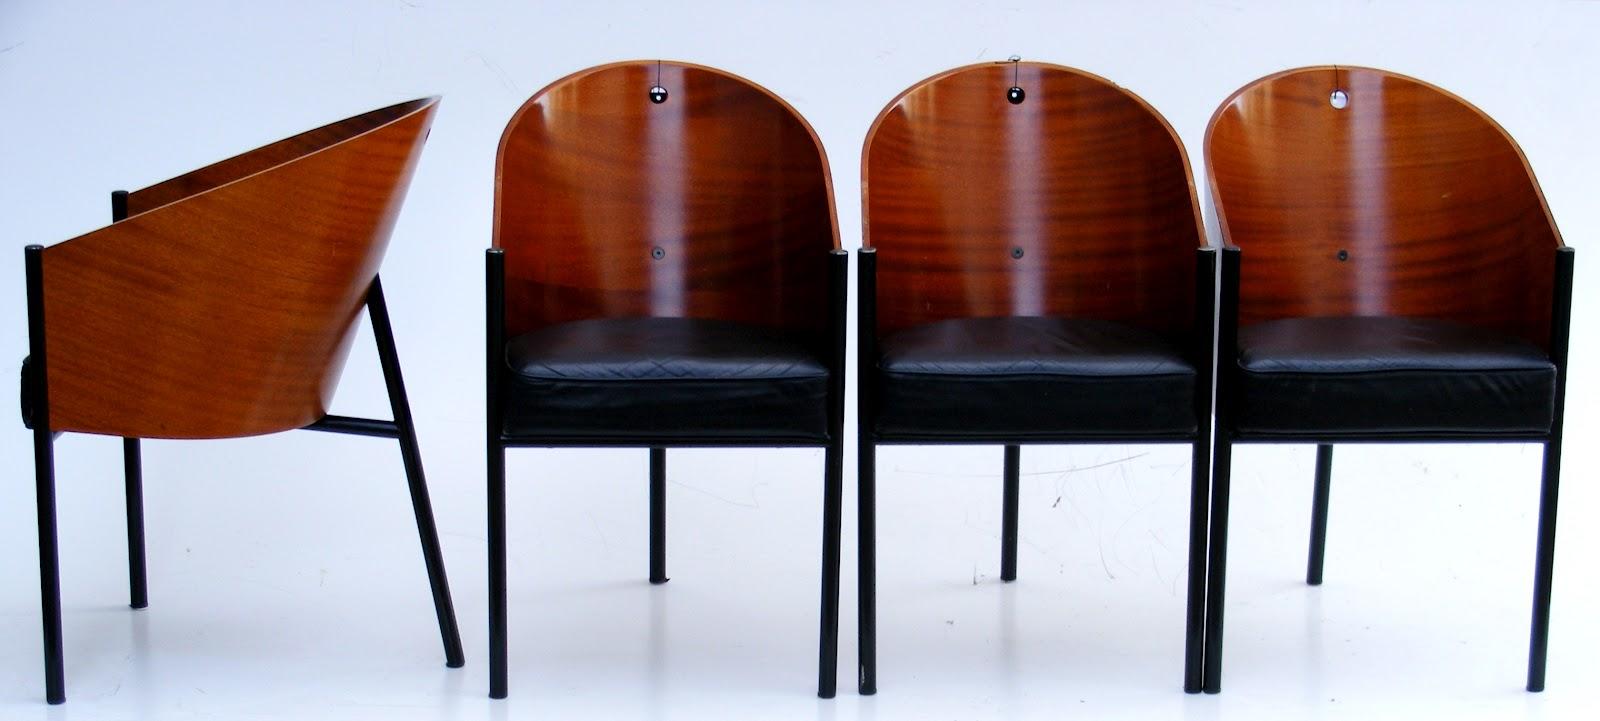 Vamp furniture new vintage furniture stock at vamp - Cafe driade ...